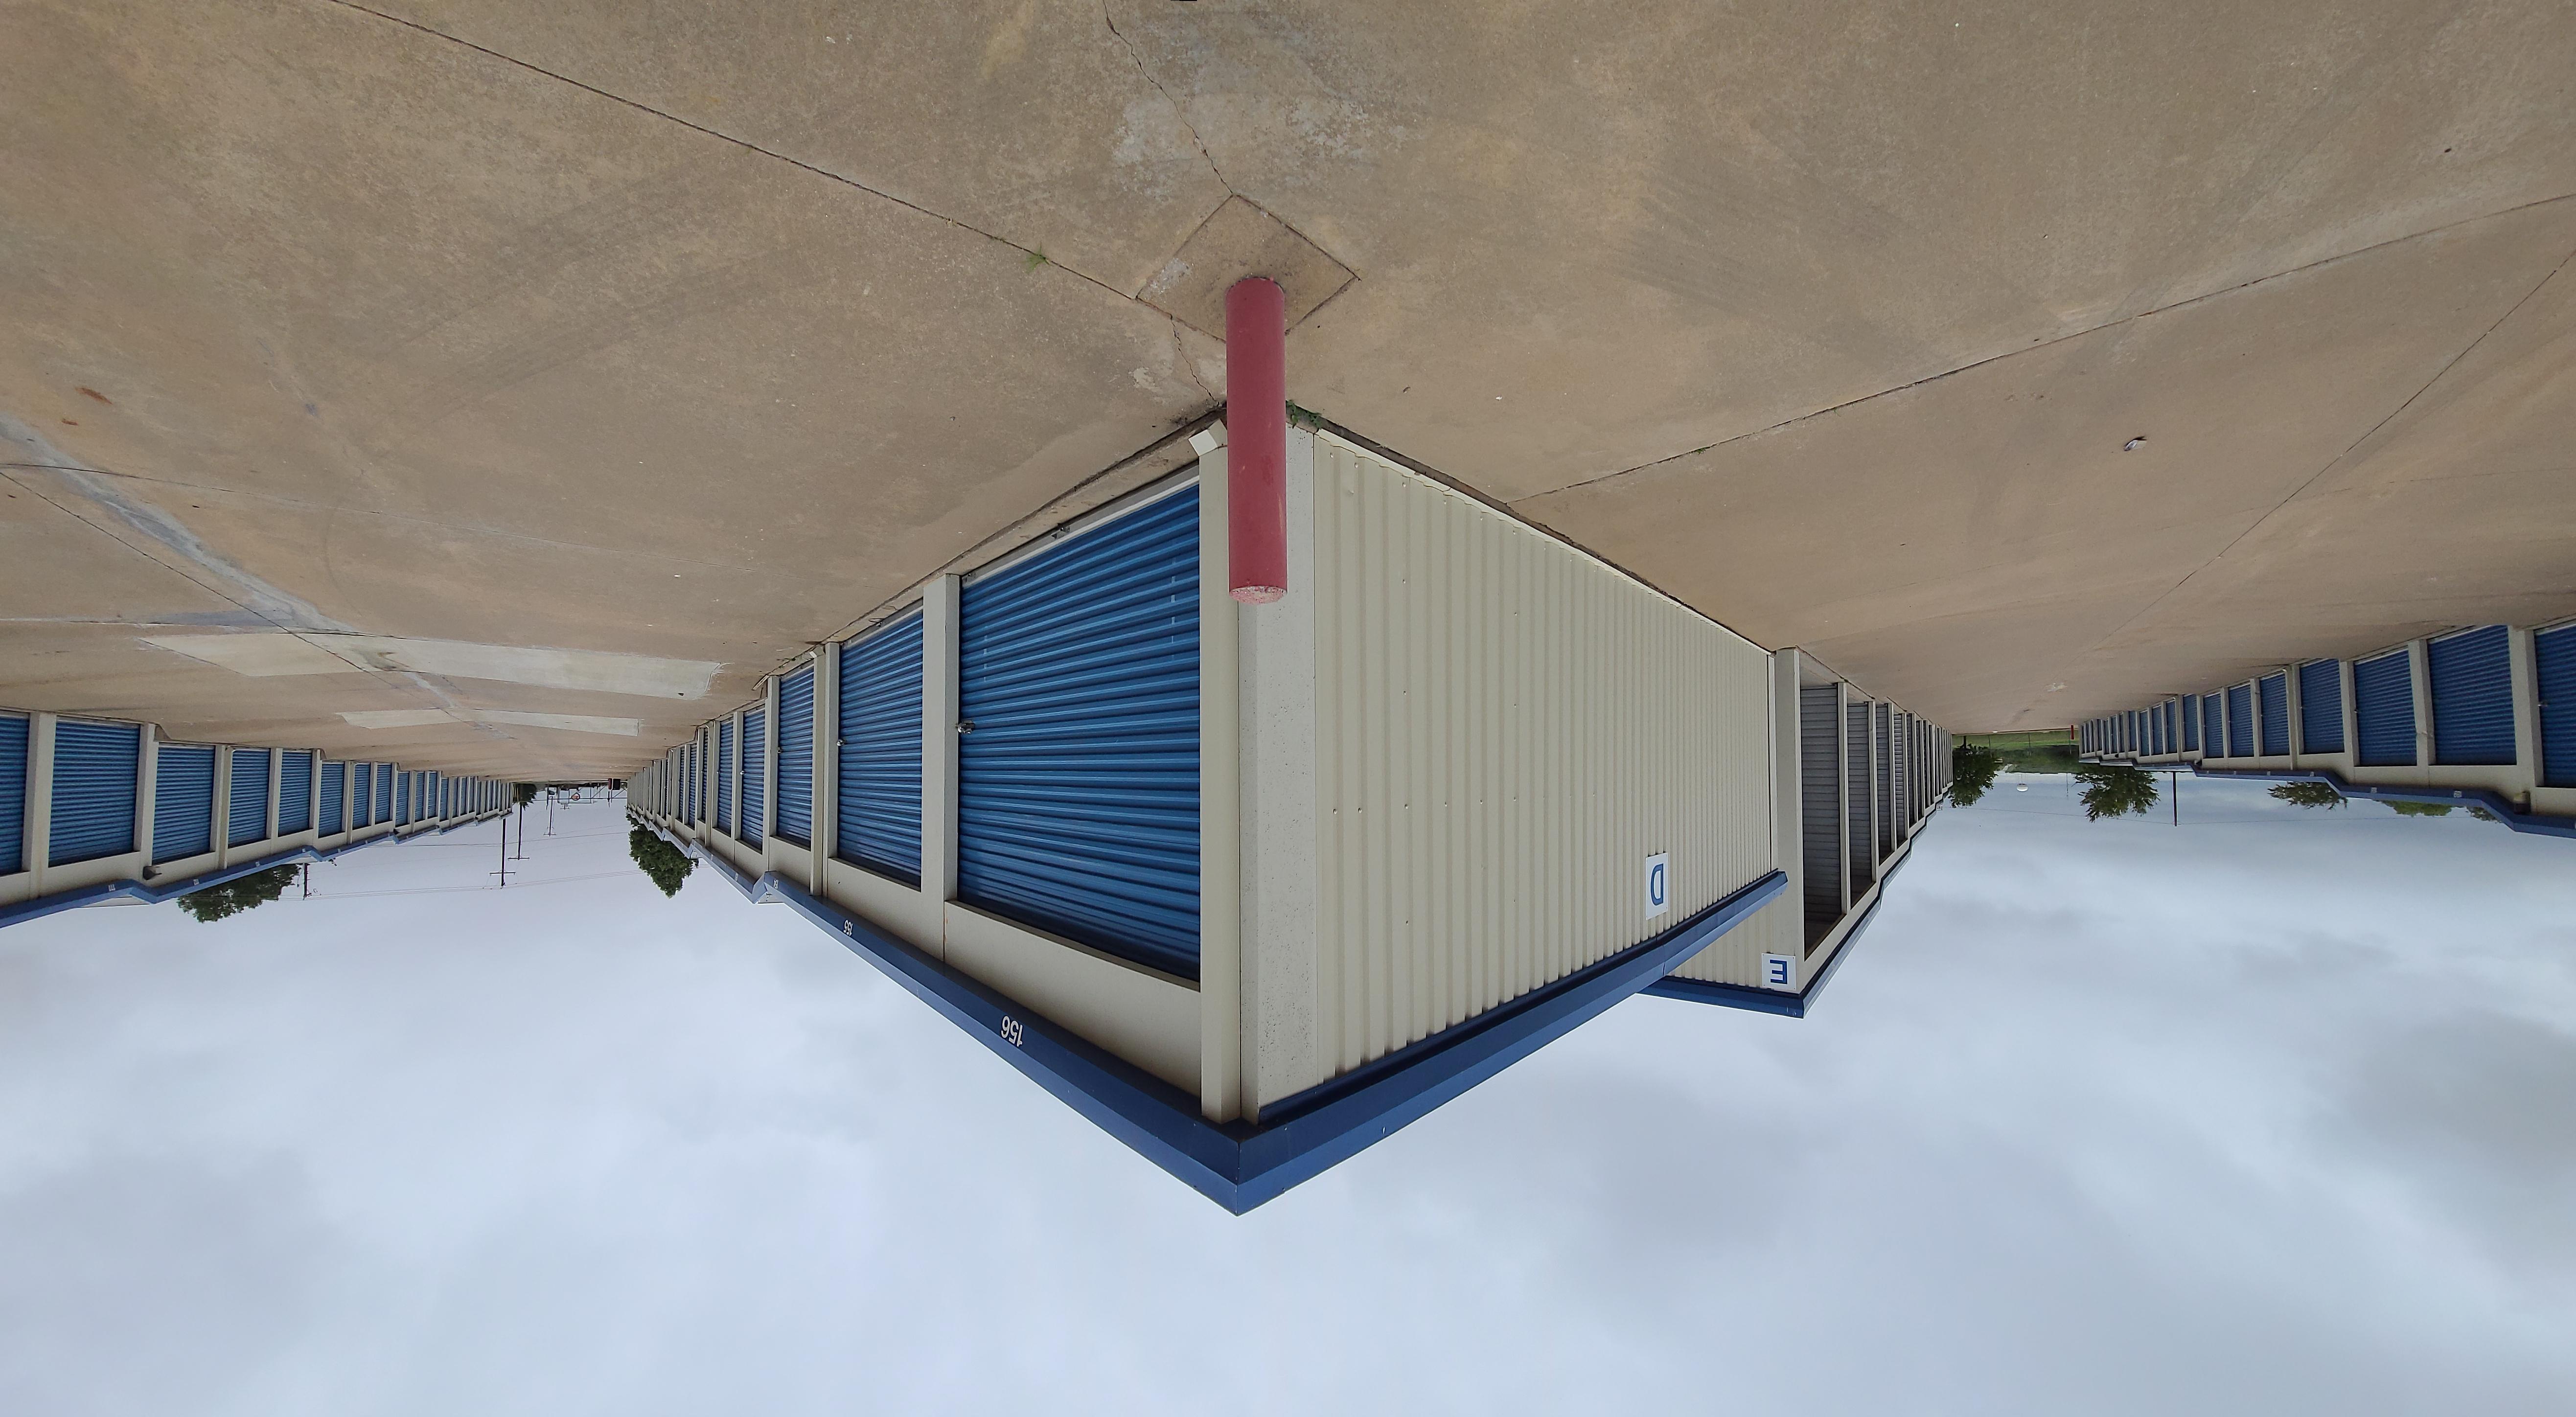 KO Storage of Wichita Falls North